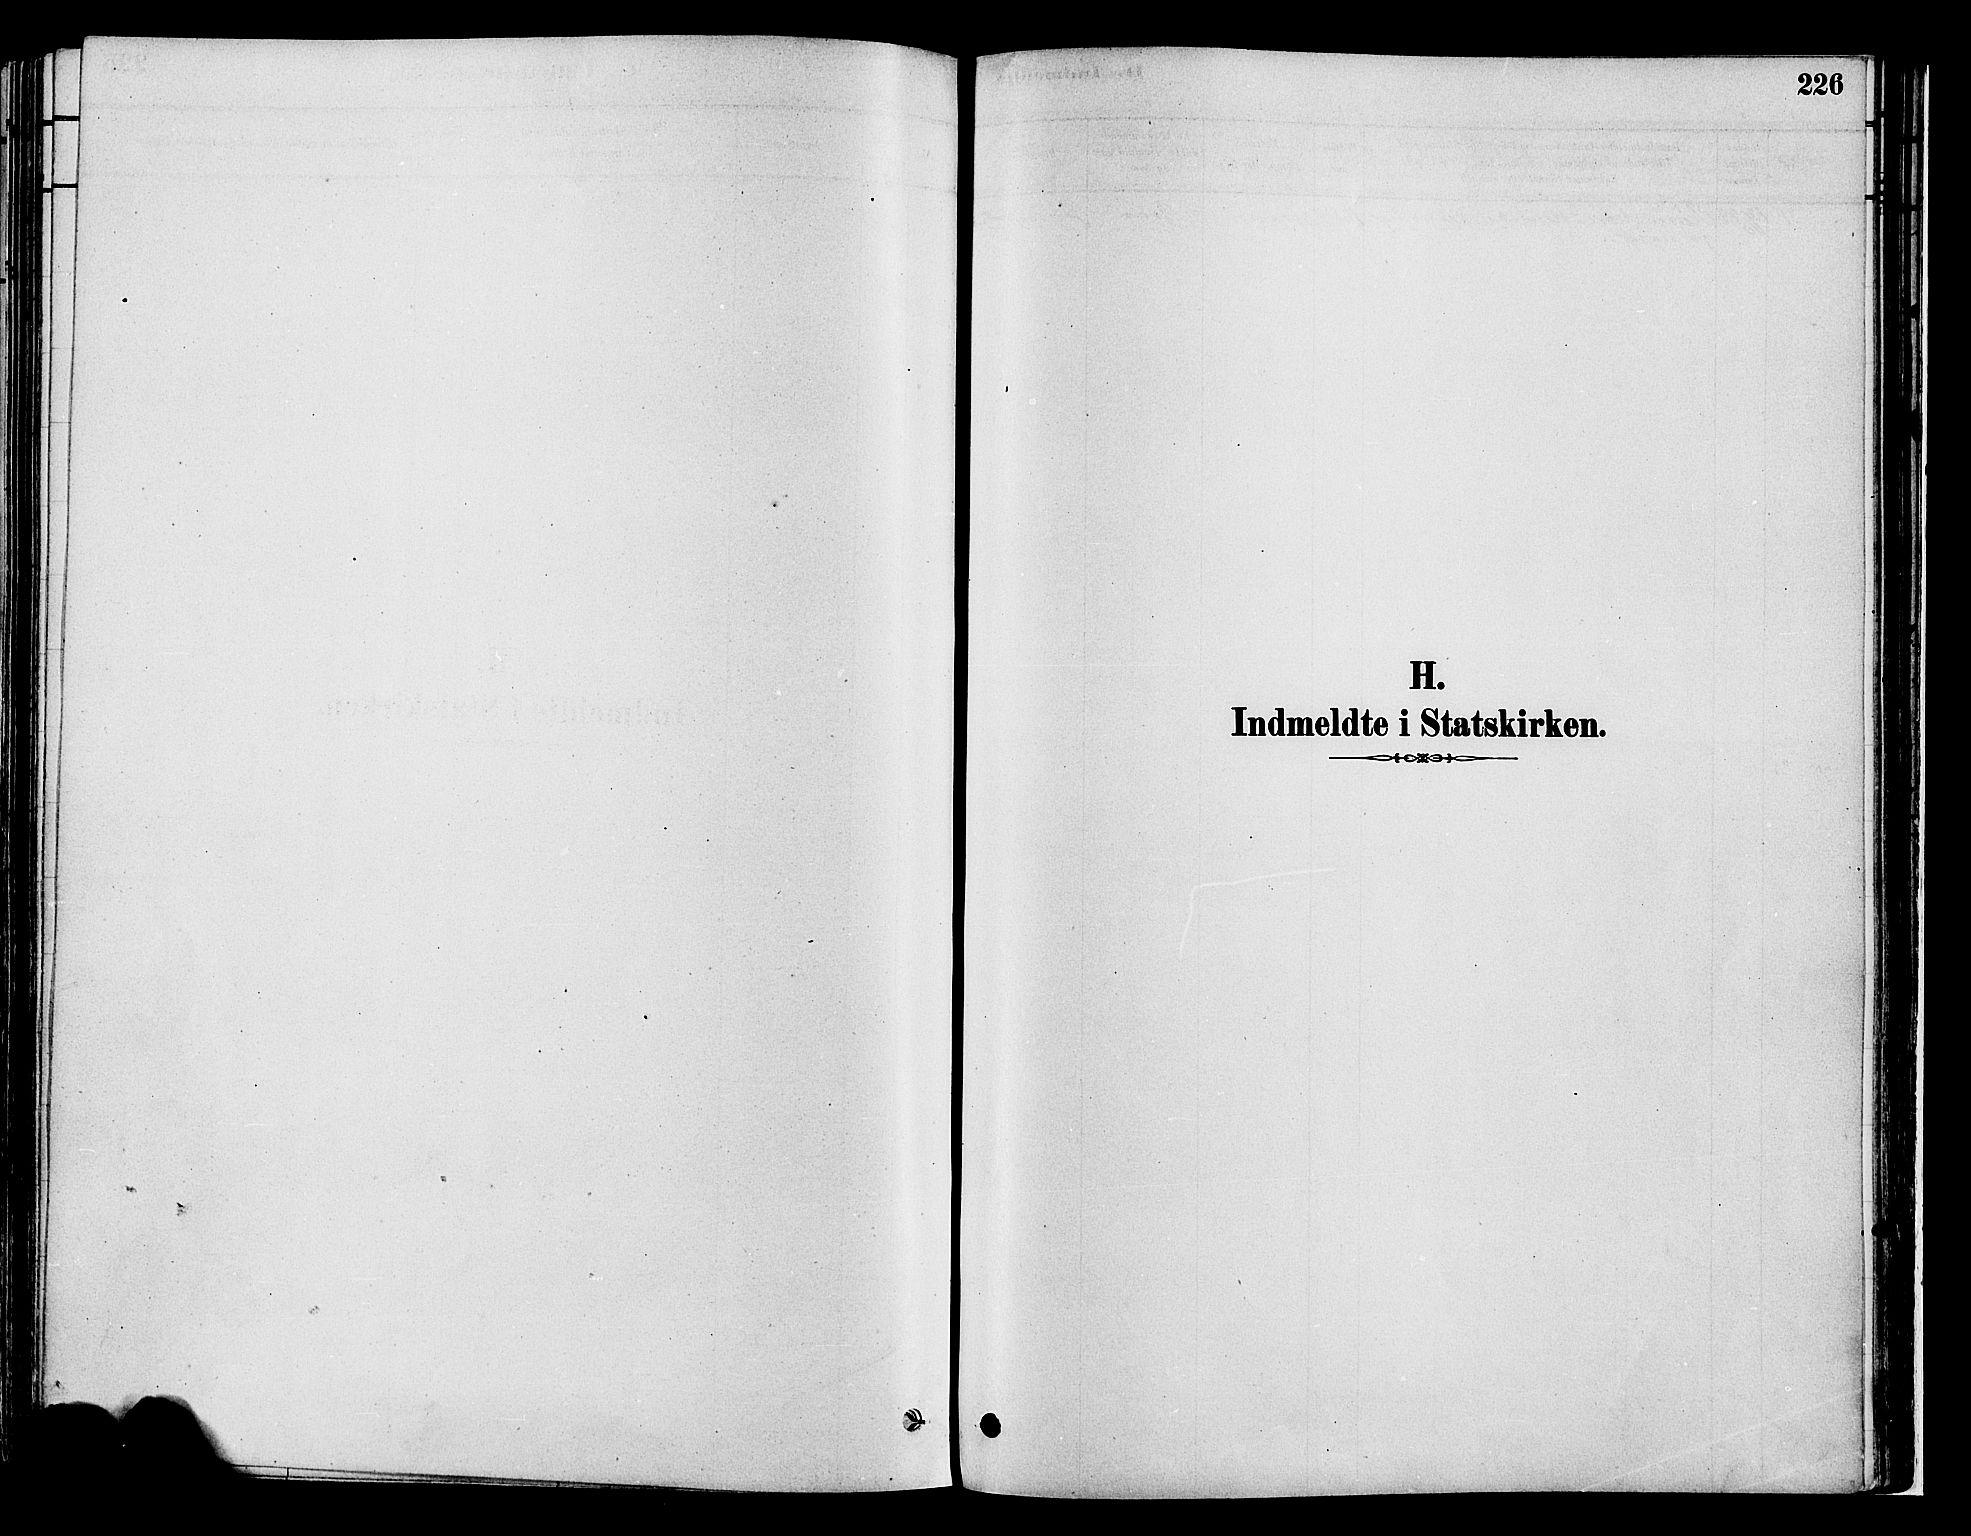 SAH, Gran prestekontor, Parish register (official) no. 14, 1880-1889, p. 226